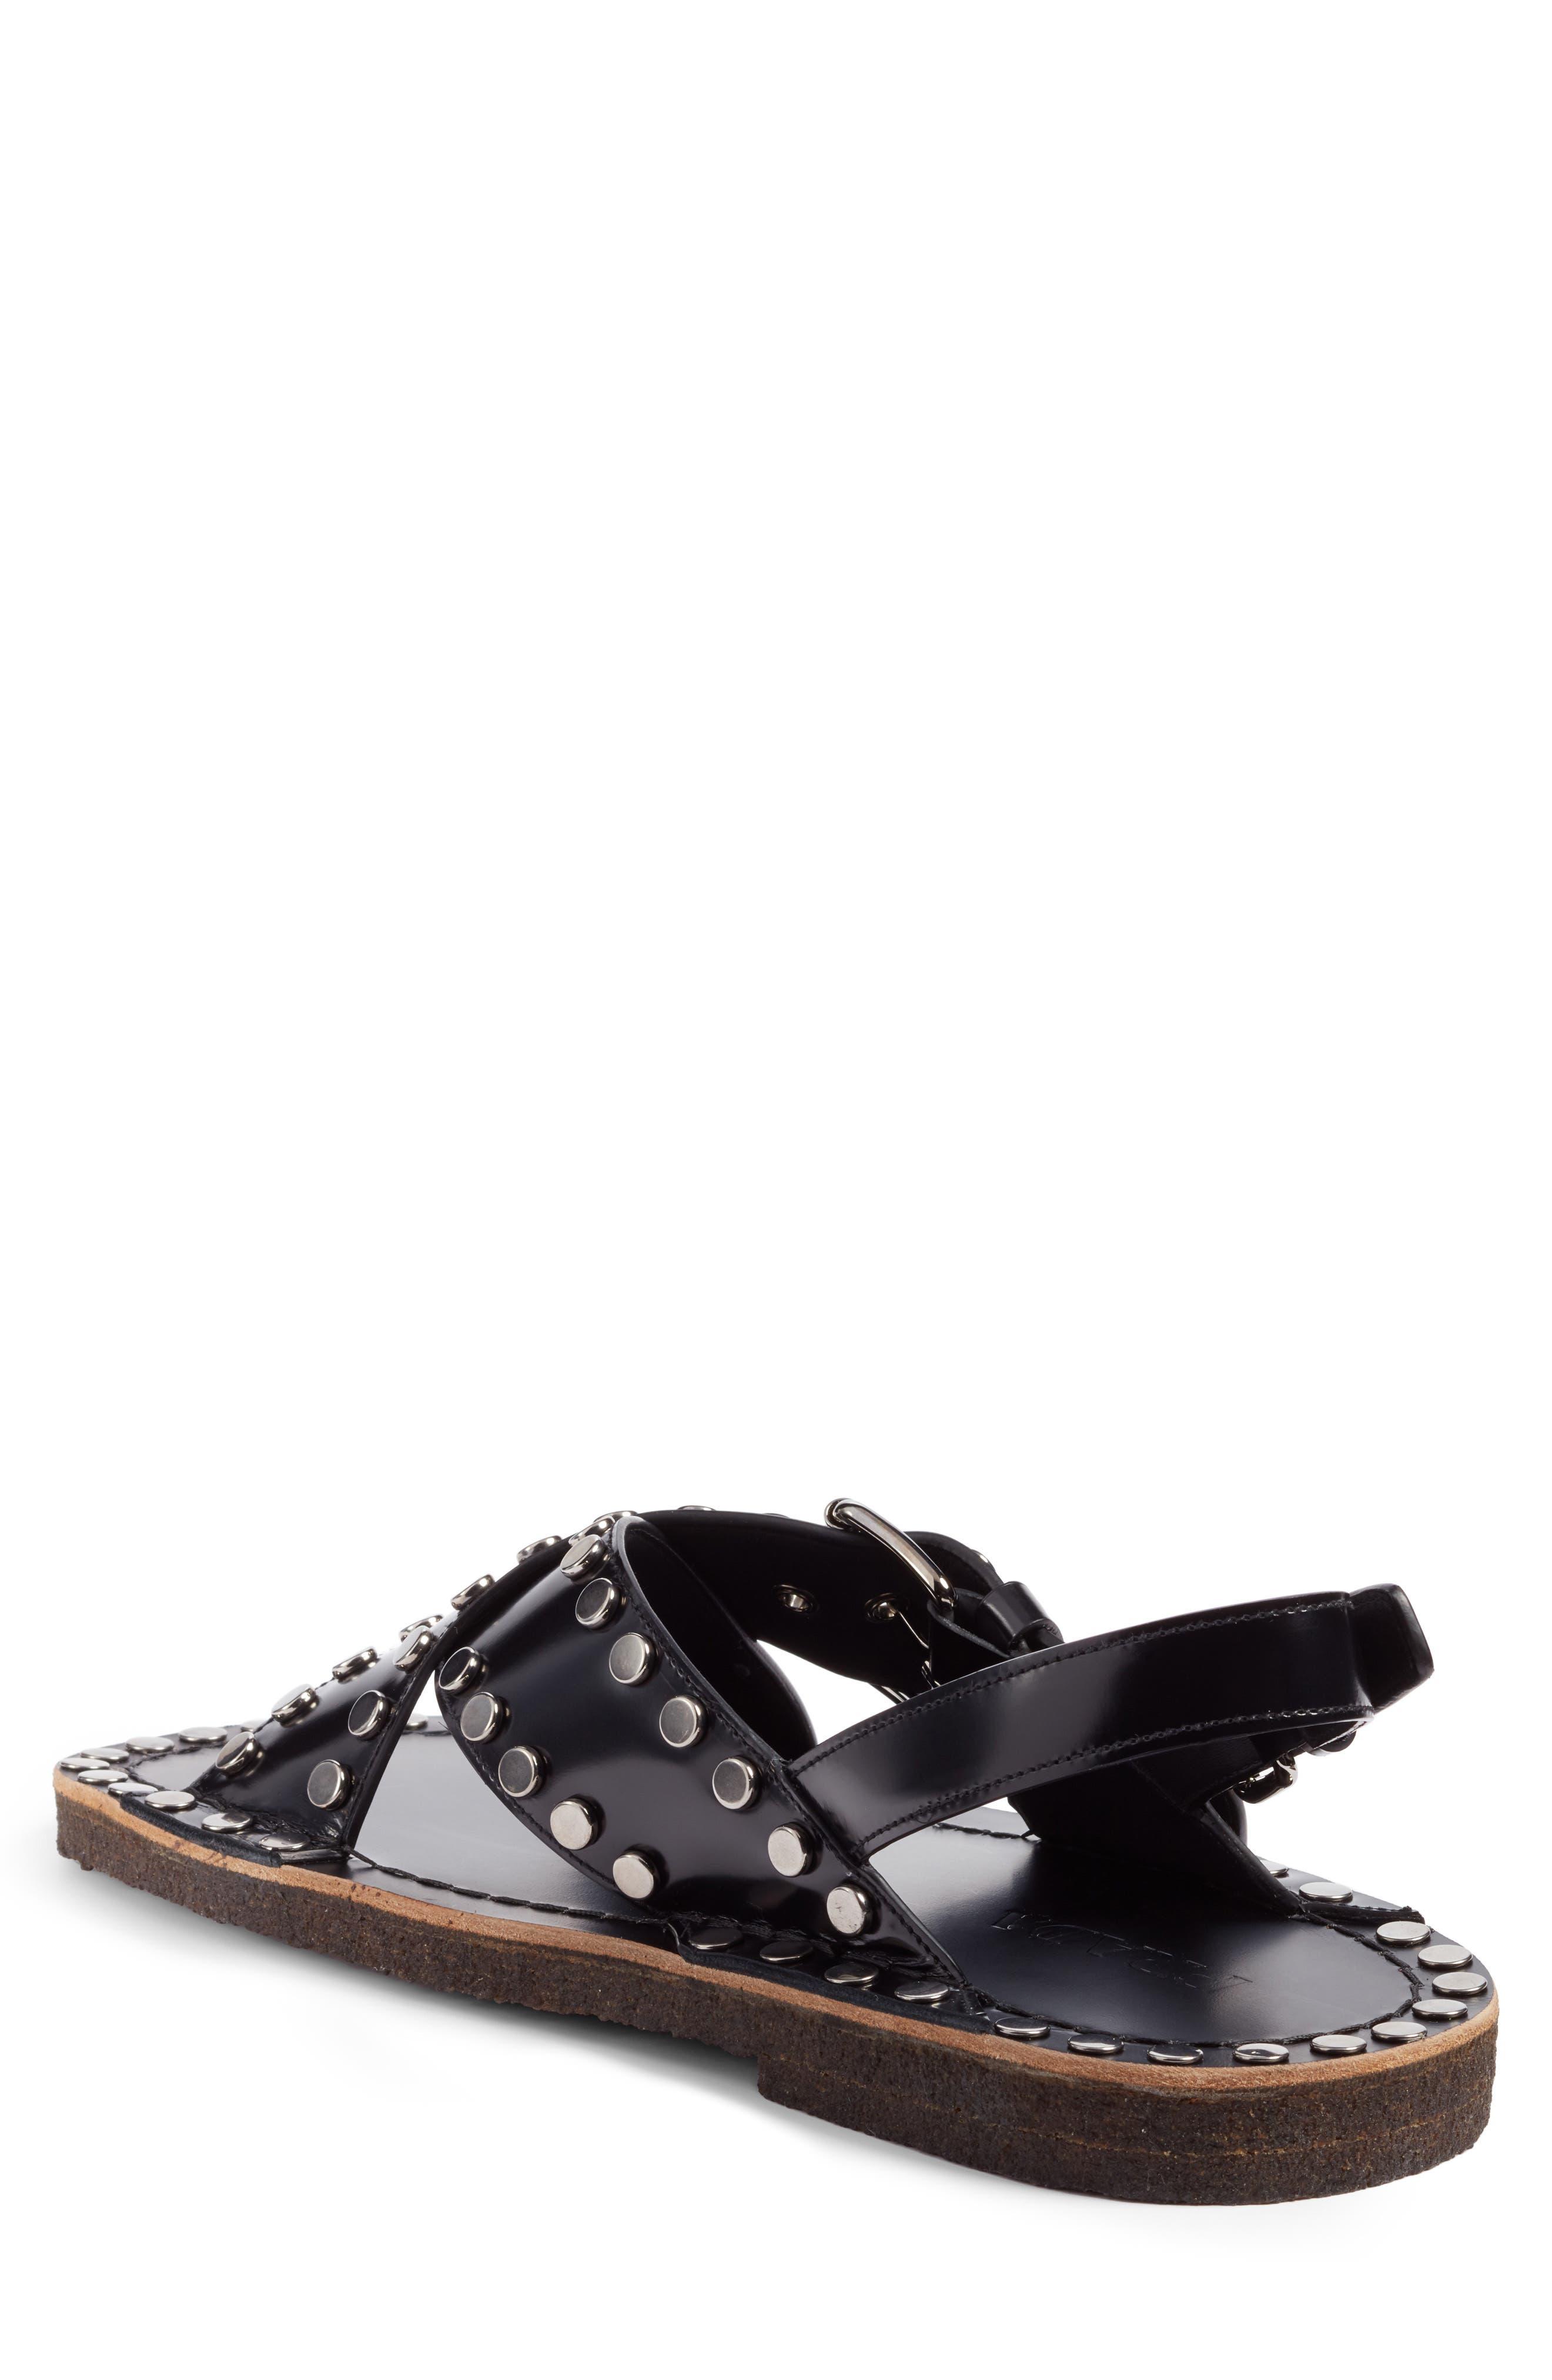 Crisscross Sandal,                             Alternate thumbnail 2, color,                             Nero Leather